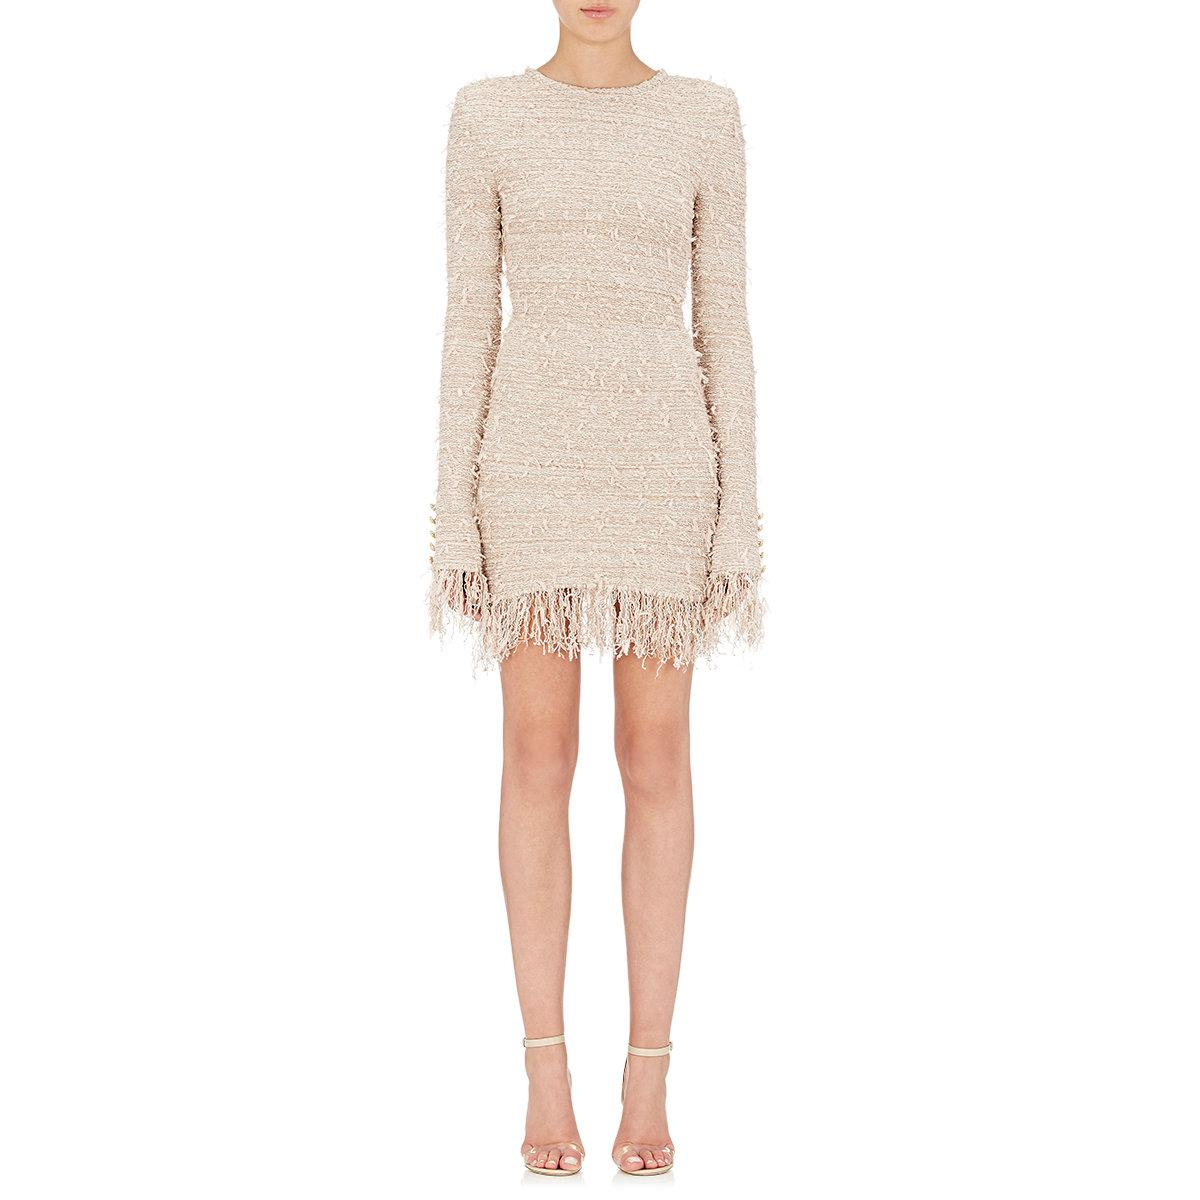 aaf18ea6 Balmain Fringed Tweed Dress in Pink - Lyst